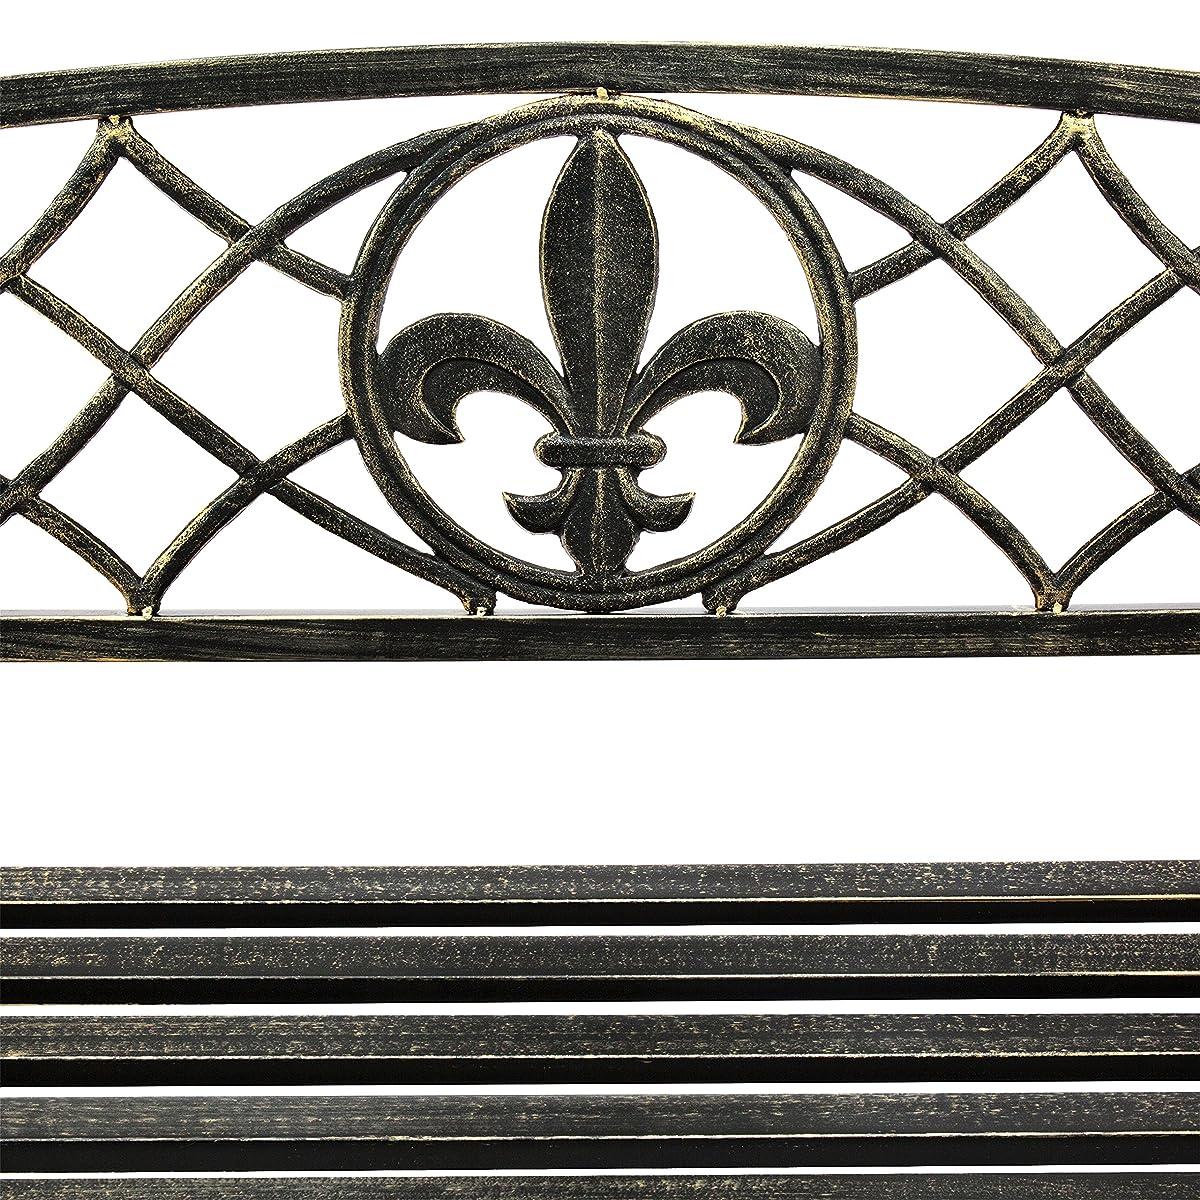 Best Choice Products Outdoor Furniture Metal Fleur-De-Lis Hanging Patio Porch Swing - Bronze